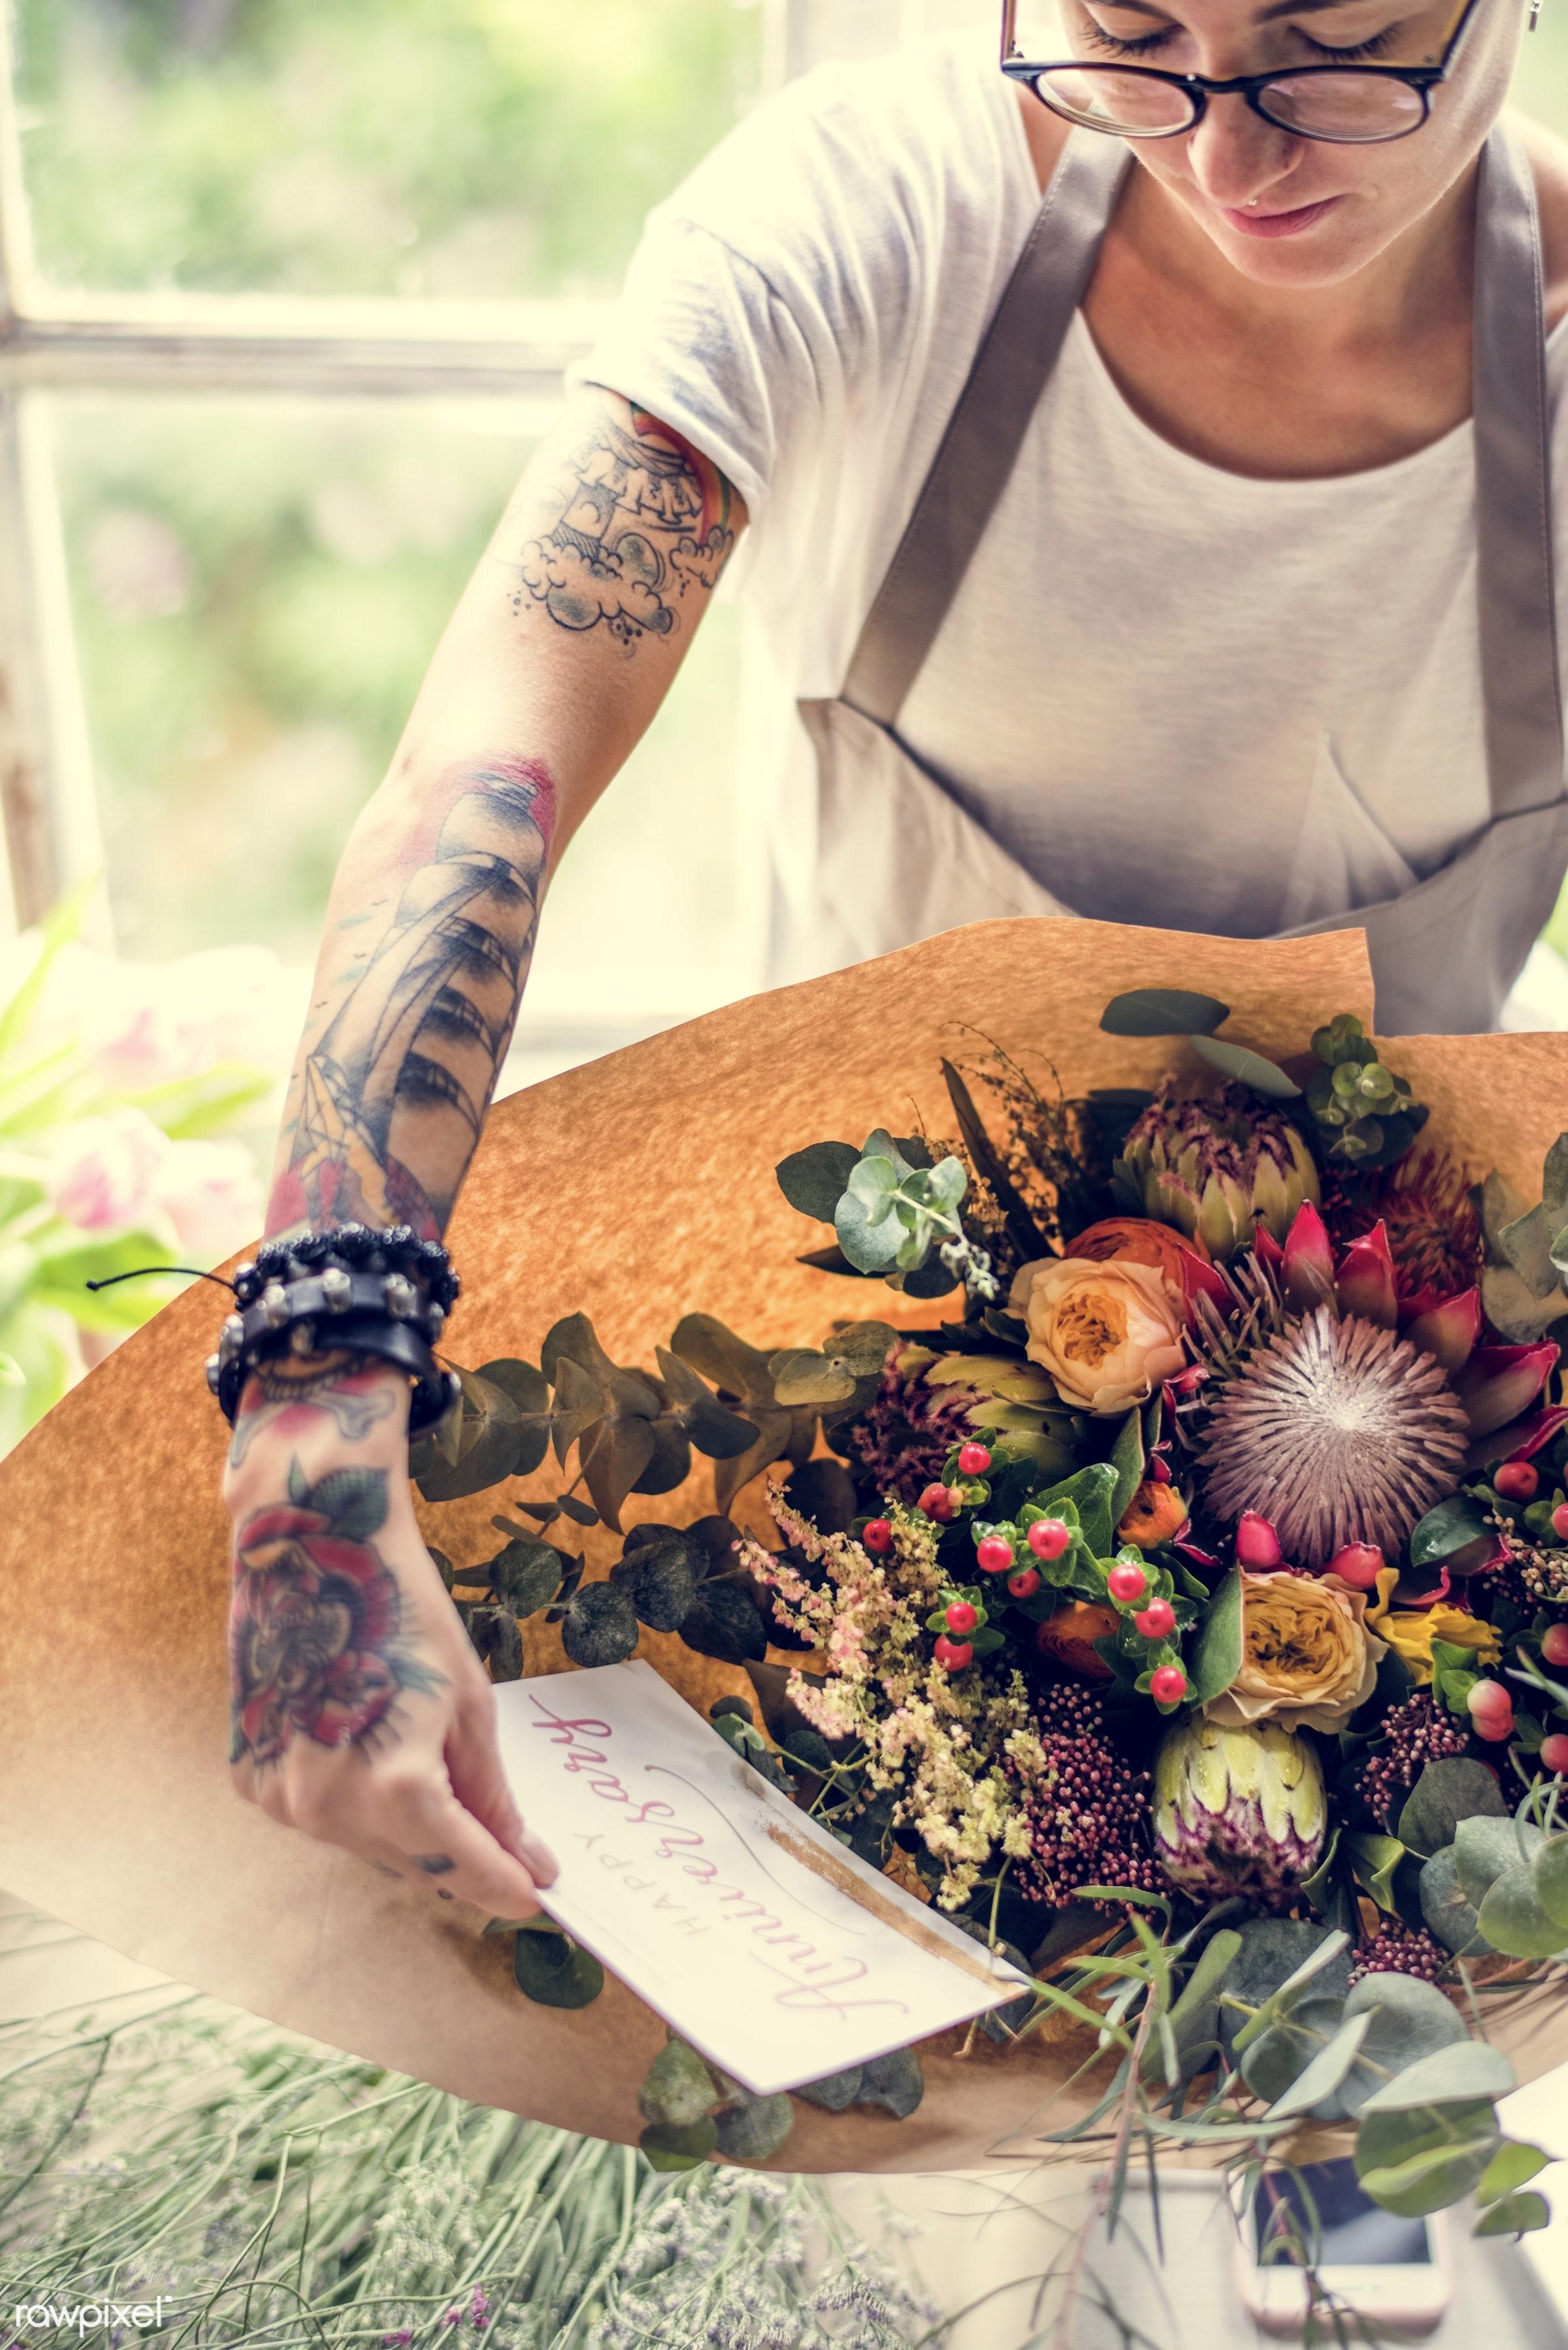 shop, bouquet, detail, person, people, wax flower, decor, nature, woman, card, tattoo, flowers, work, refreshment, florist,...